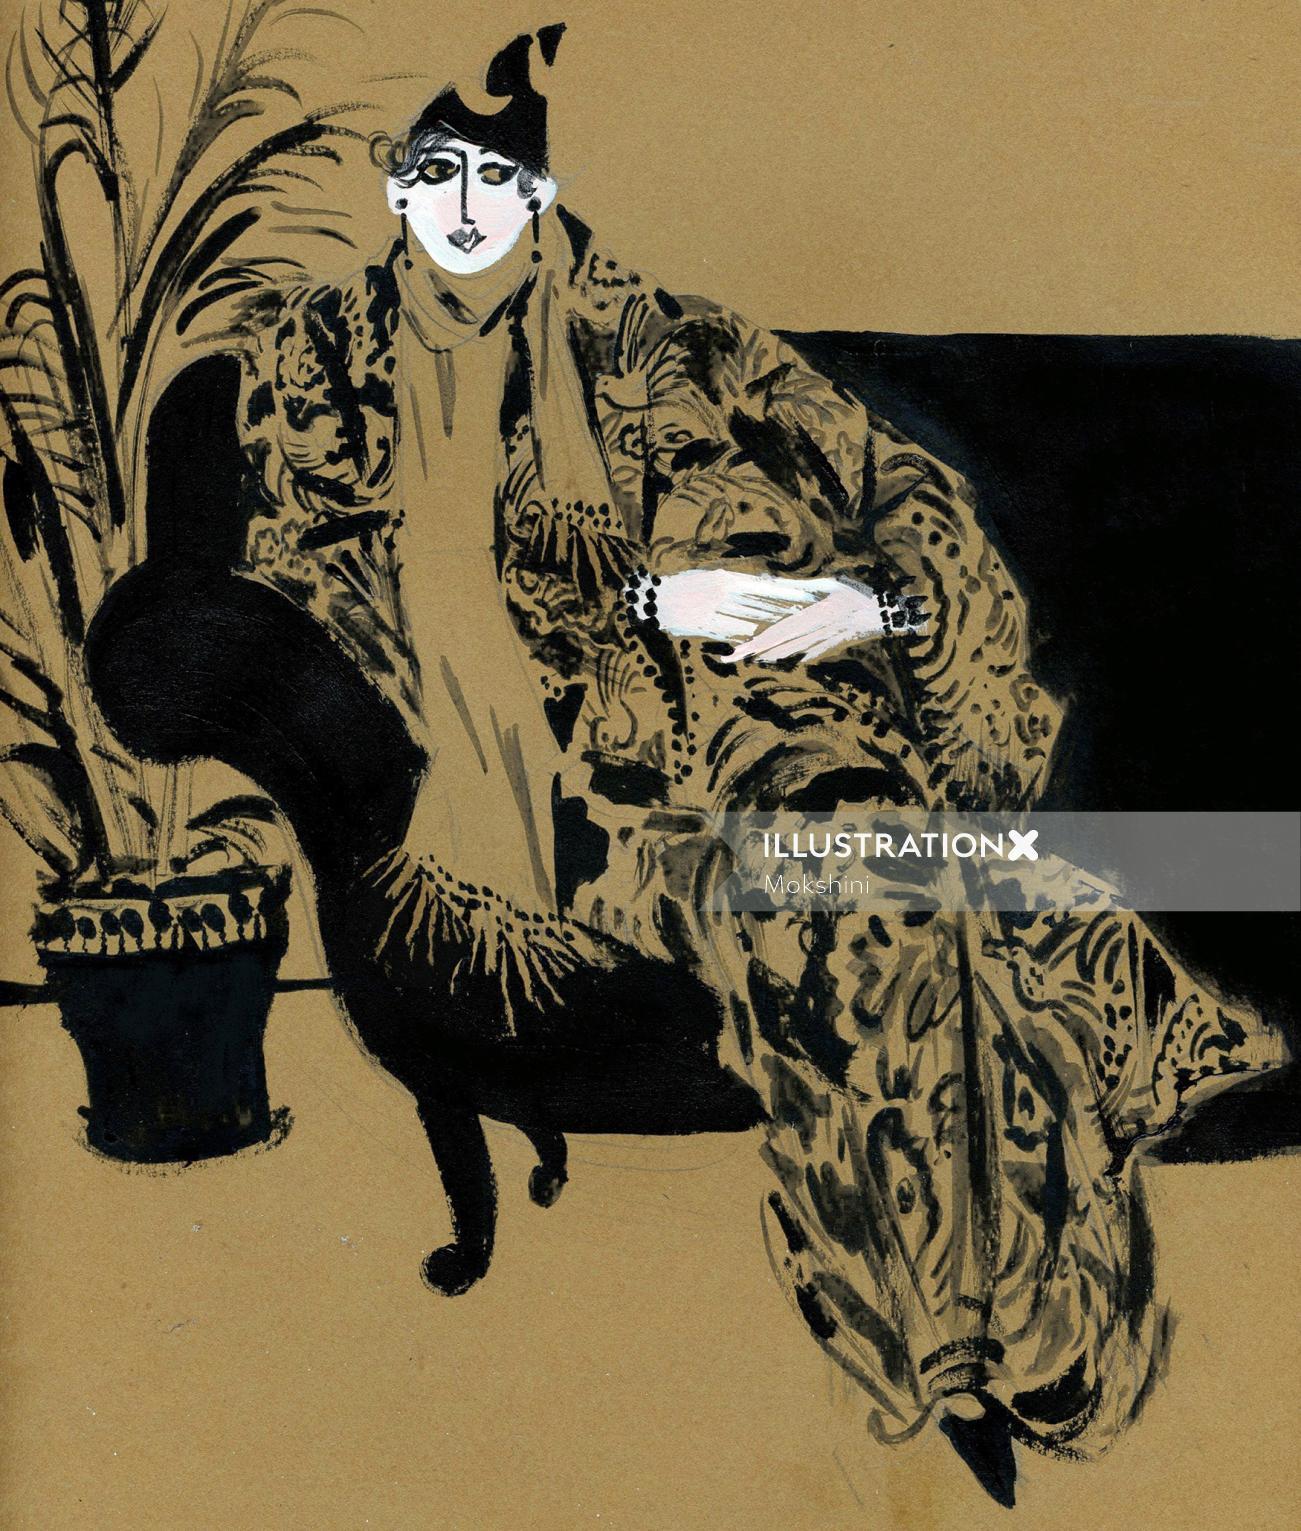 Fashion illustration of Tziporah Salamon